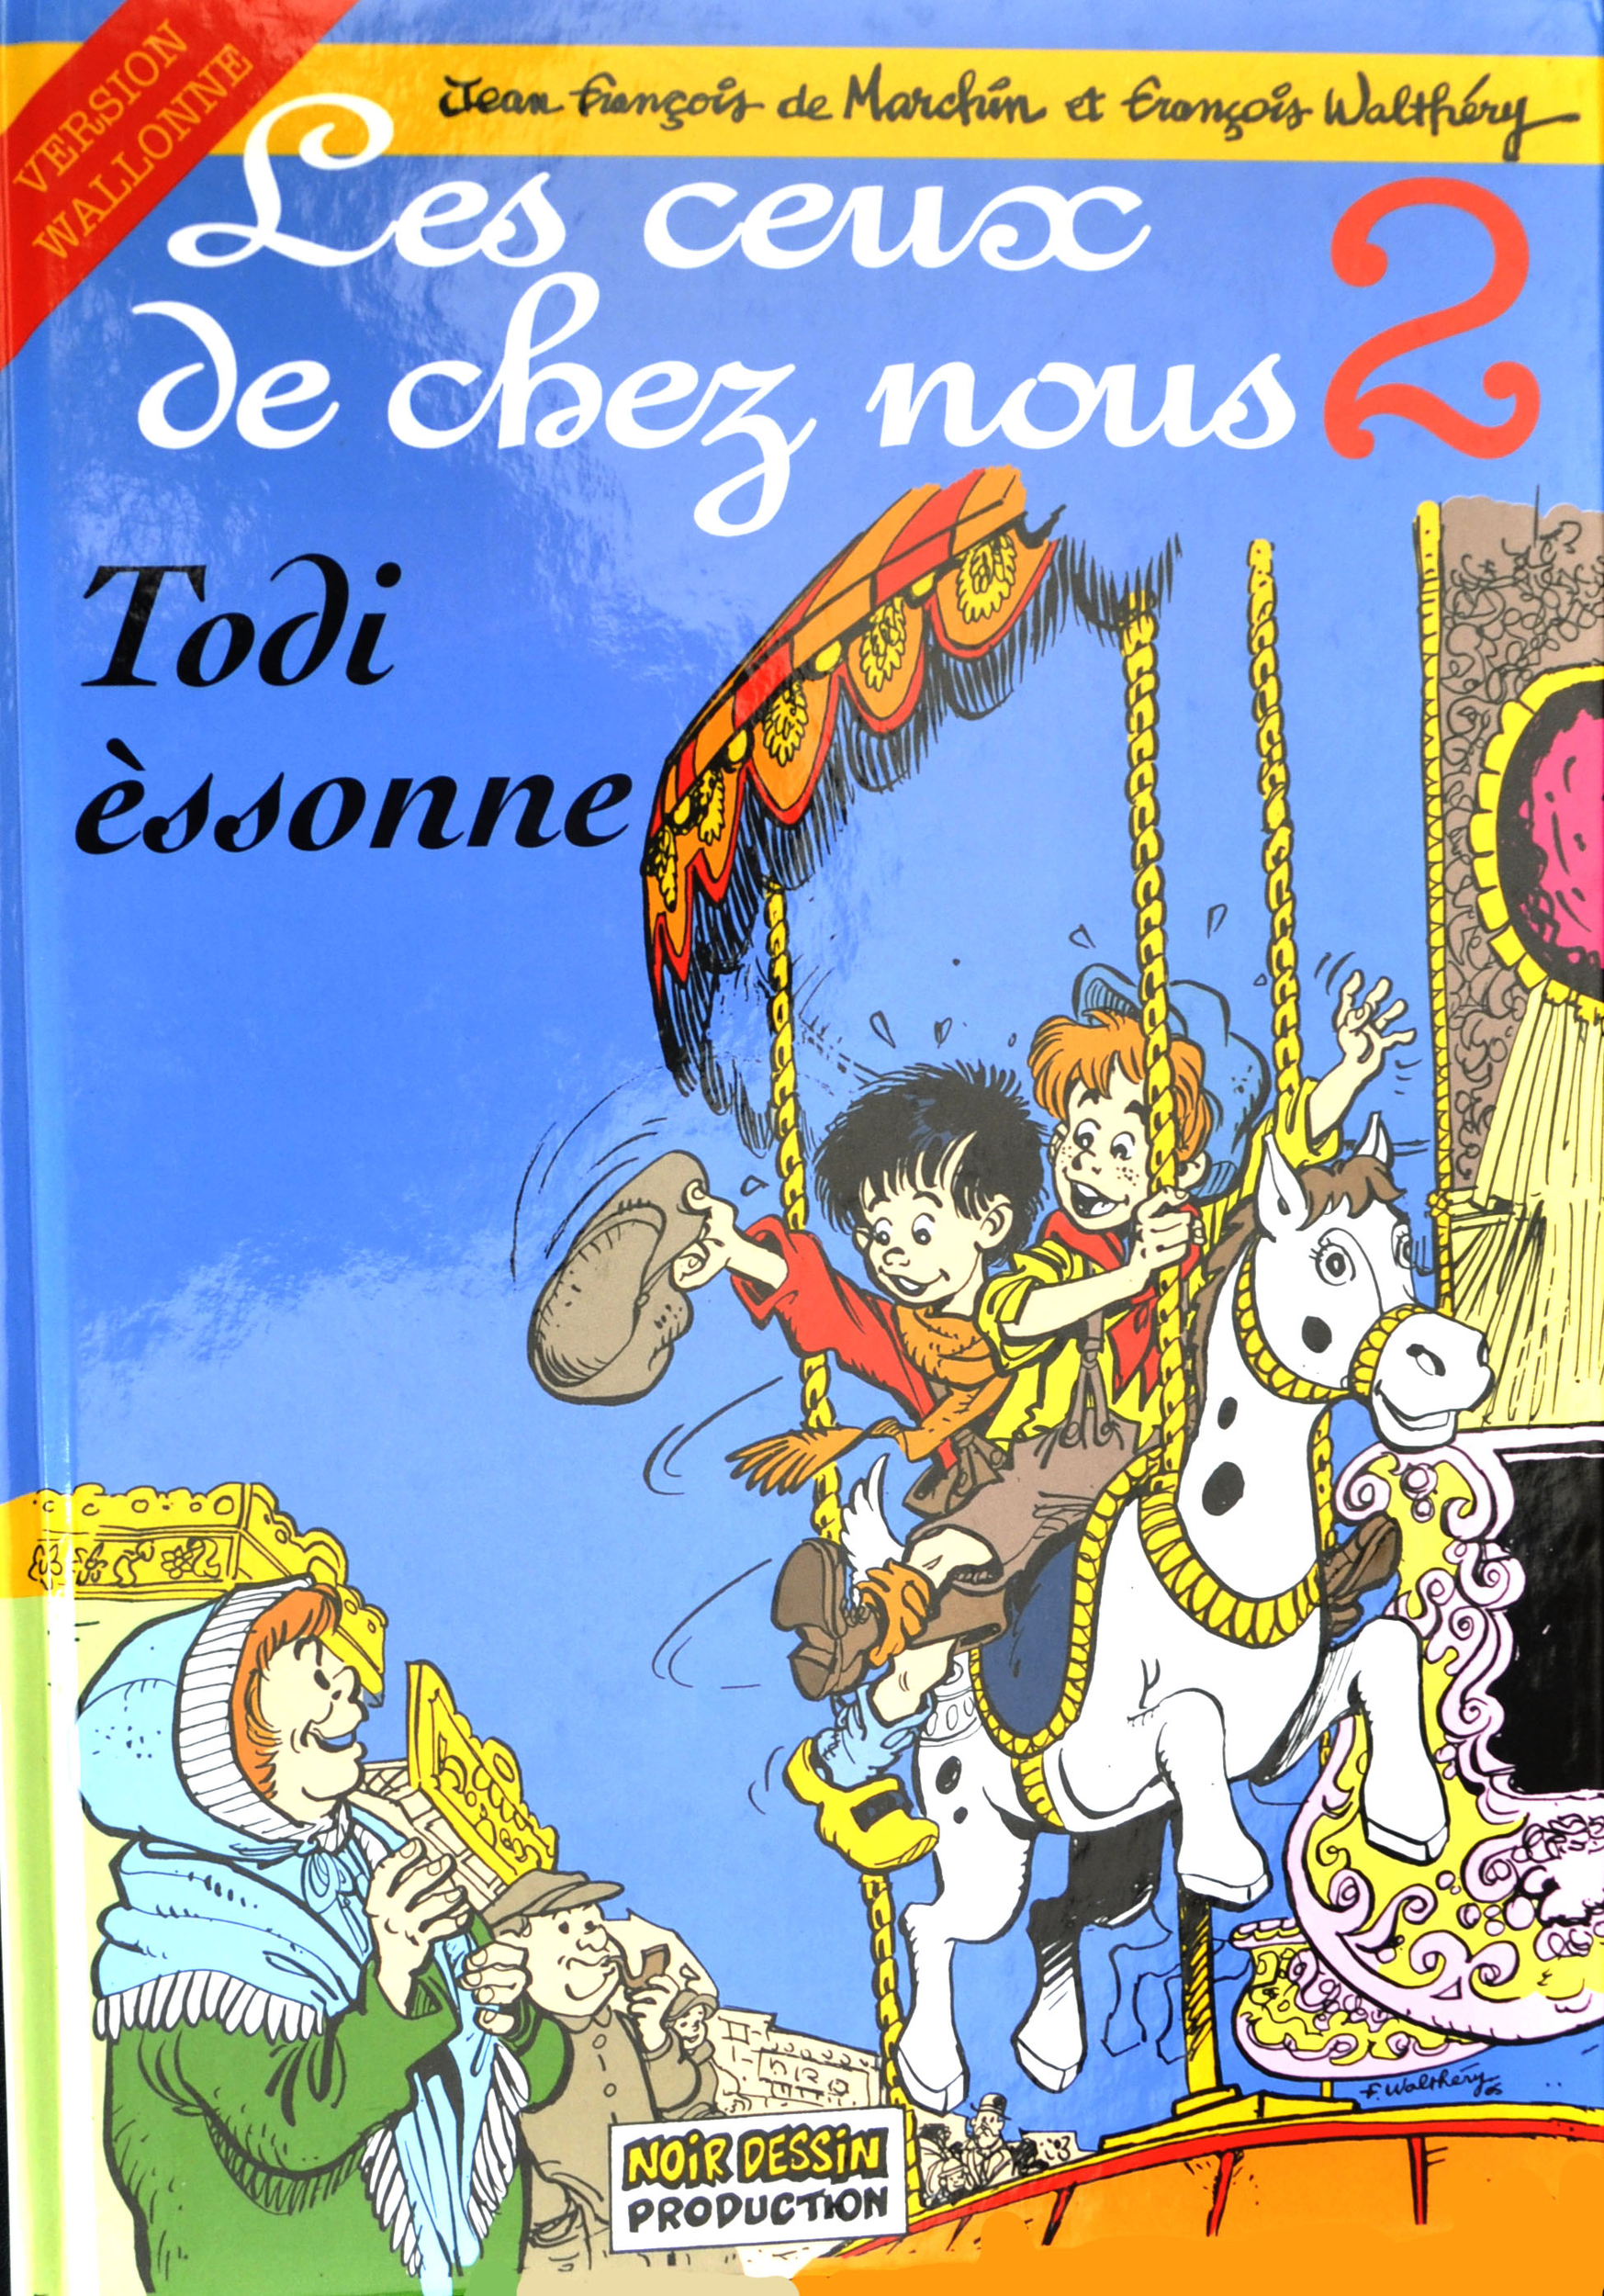 wallon liégeois-tome 2-18€-épuisé